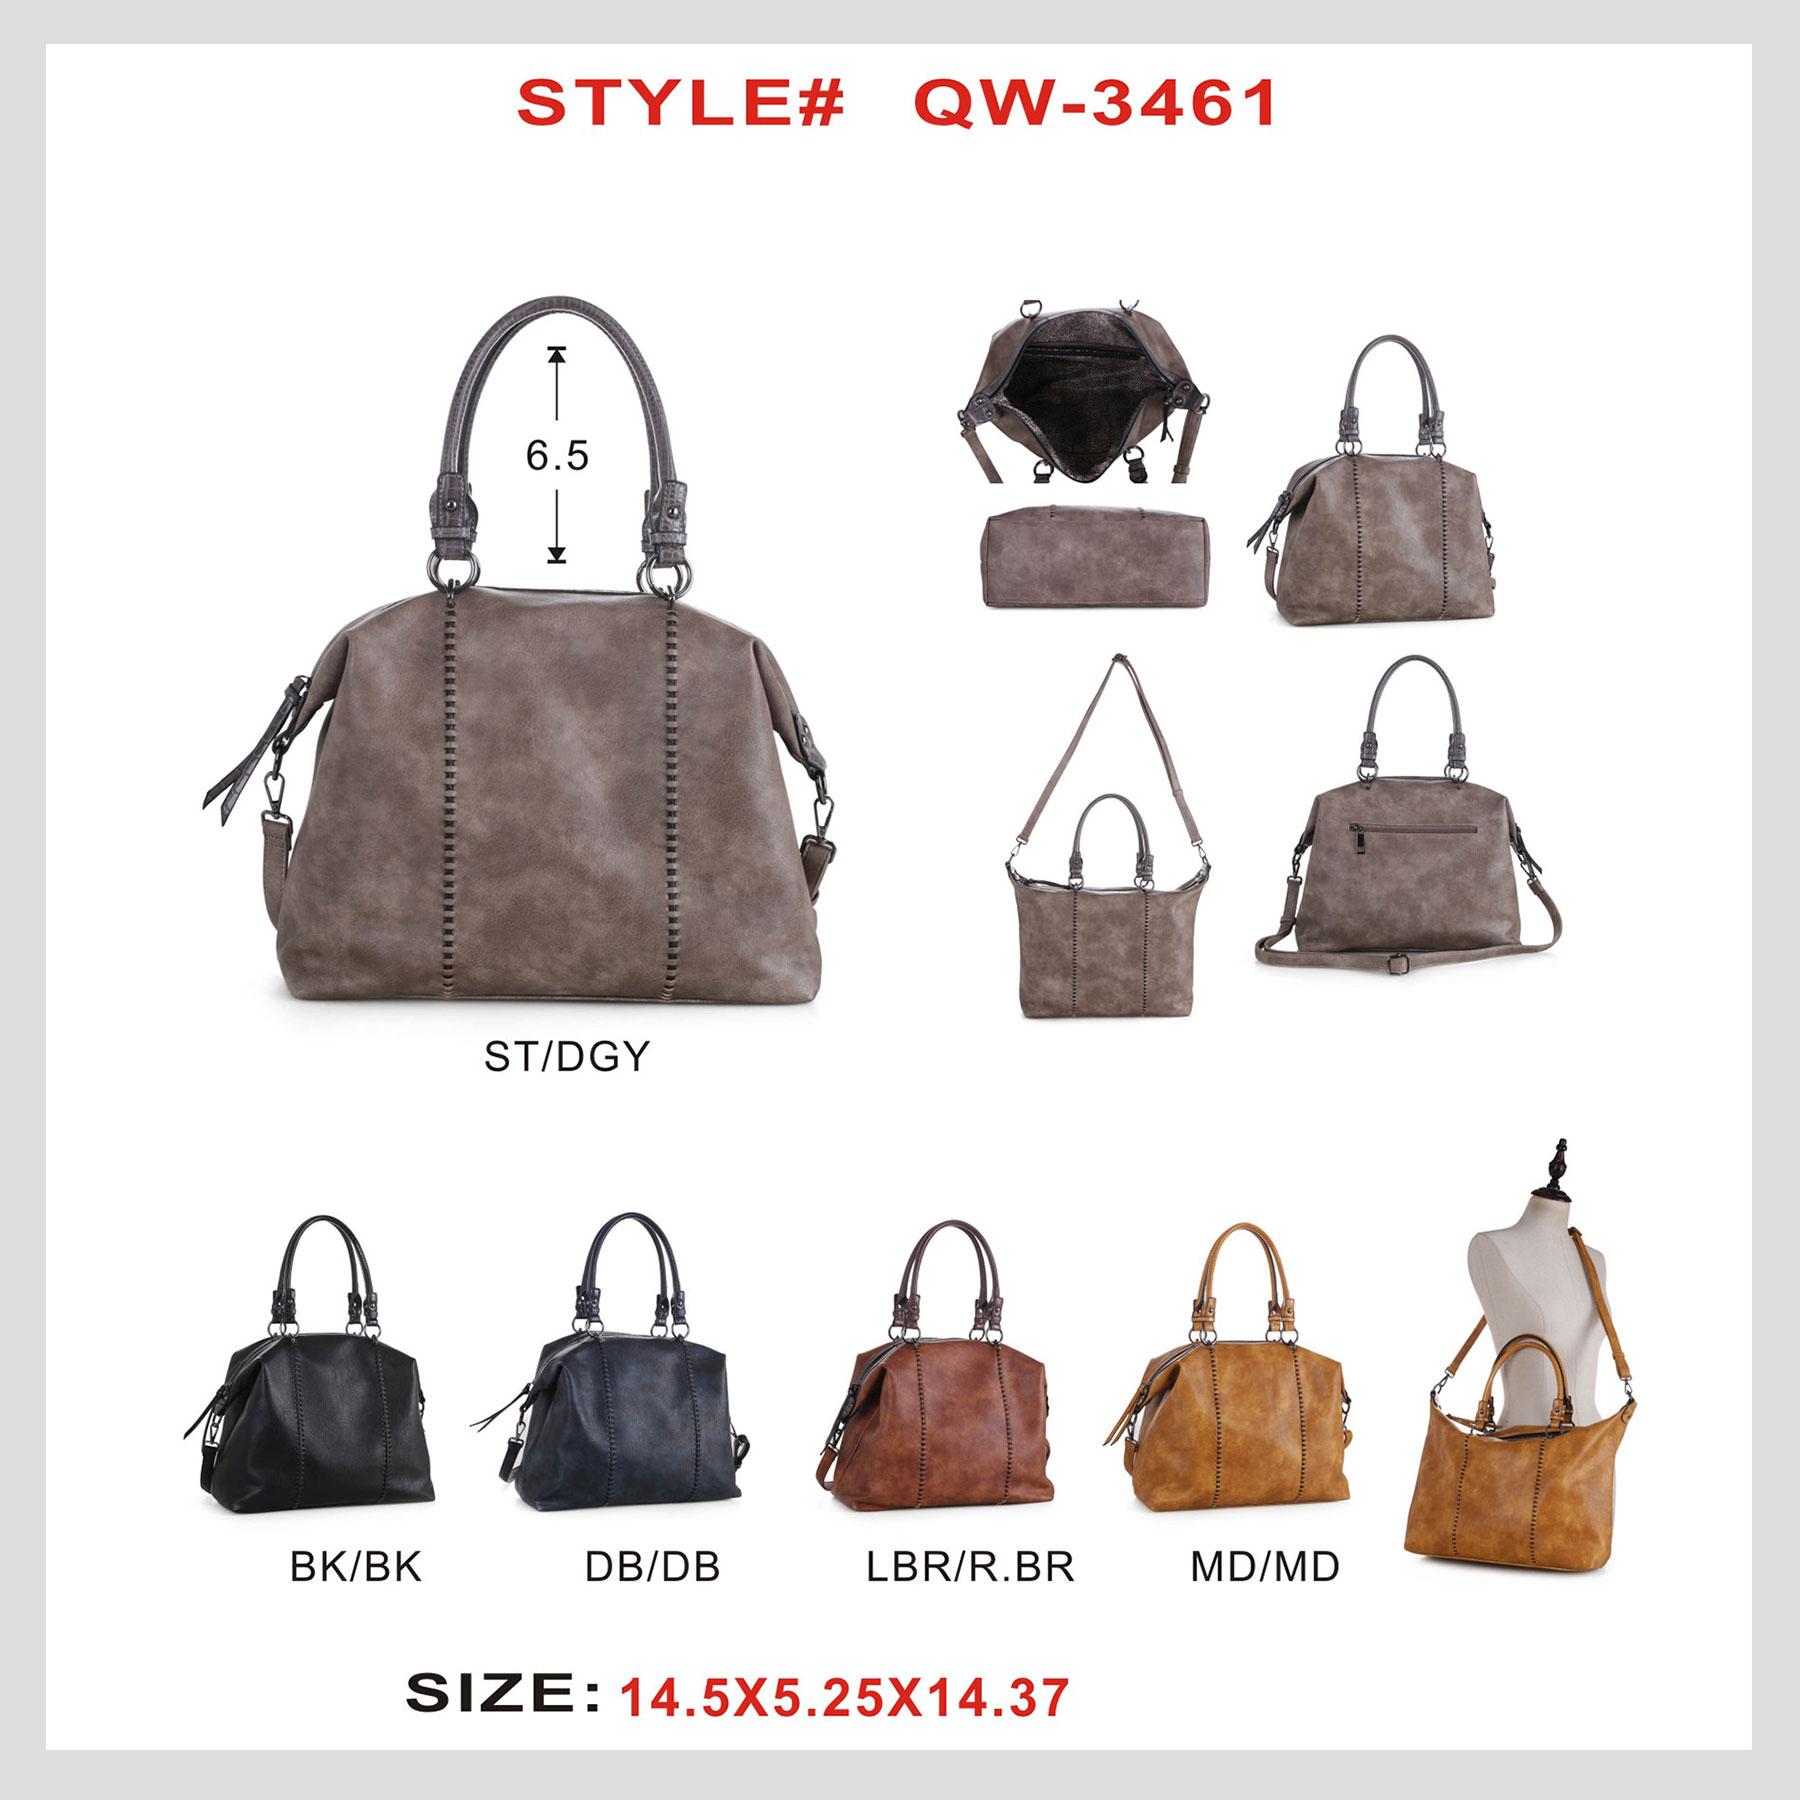 QW-3461.jpg